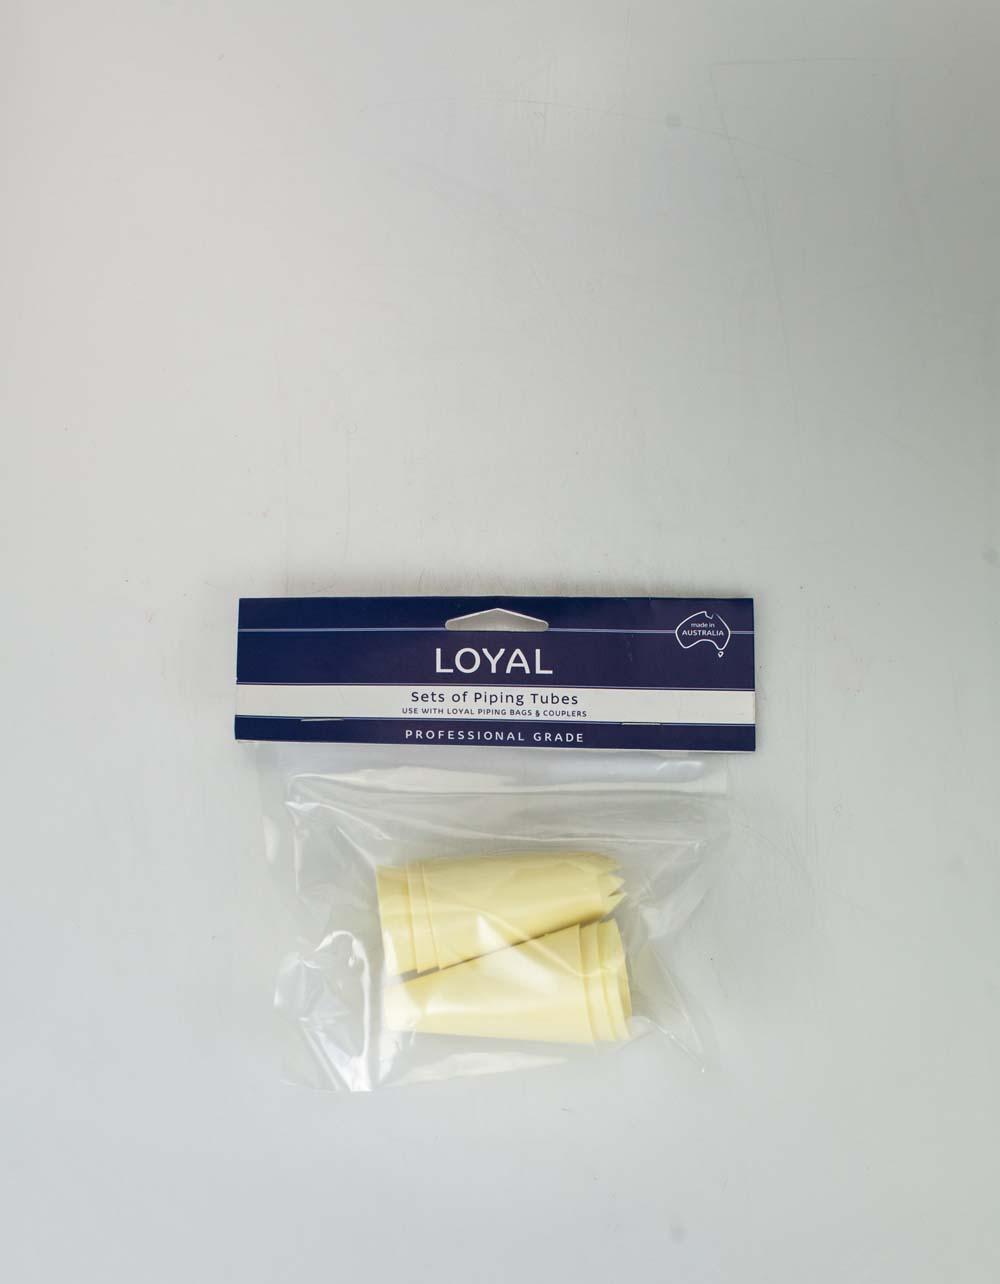 Loyal Professional Grade Polypropylene Piping Tubes - Set of 6